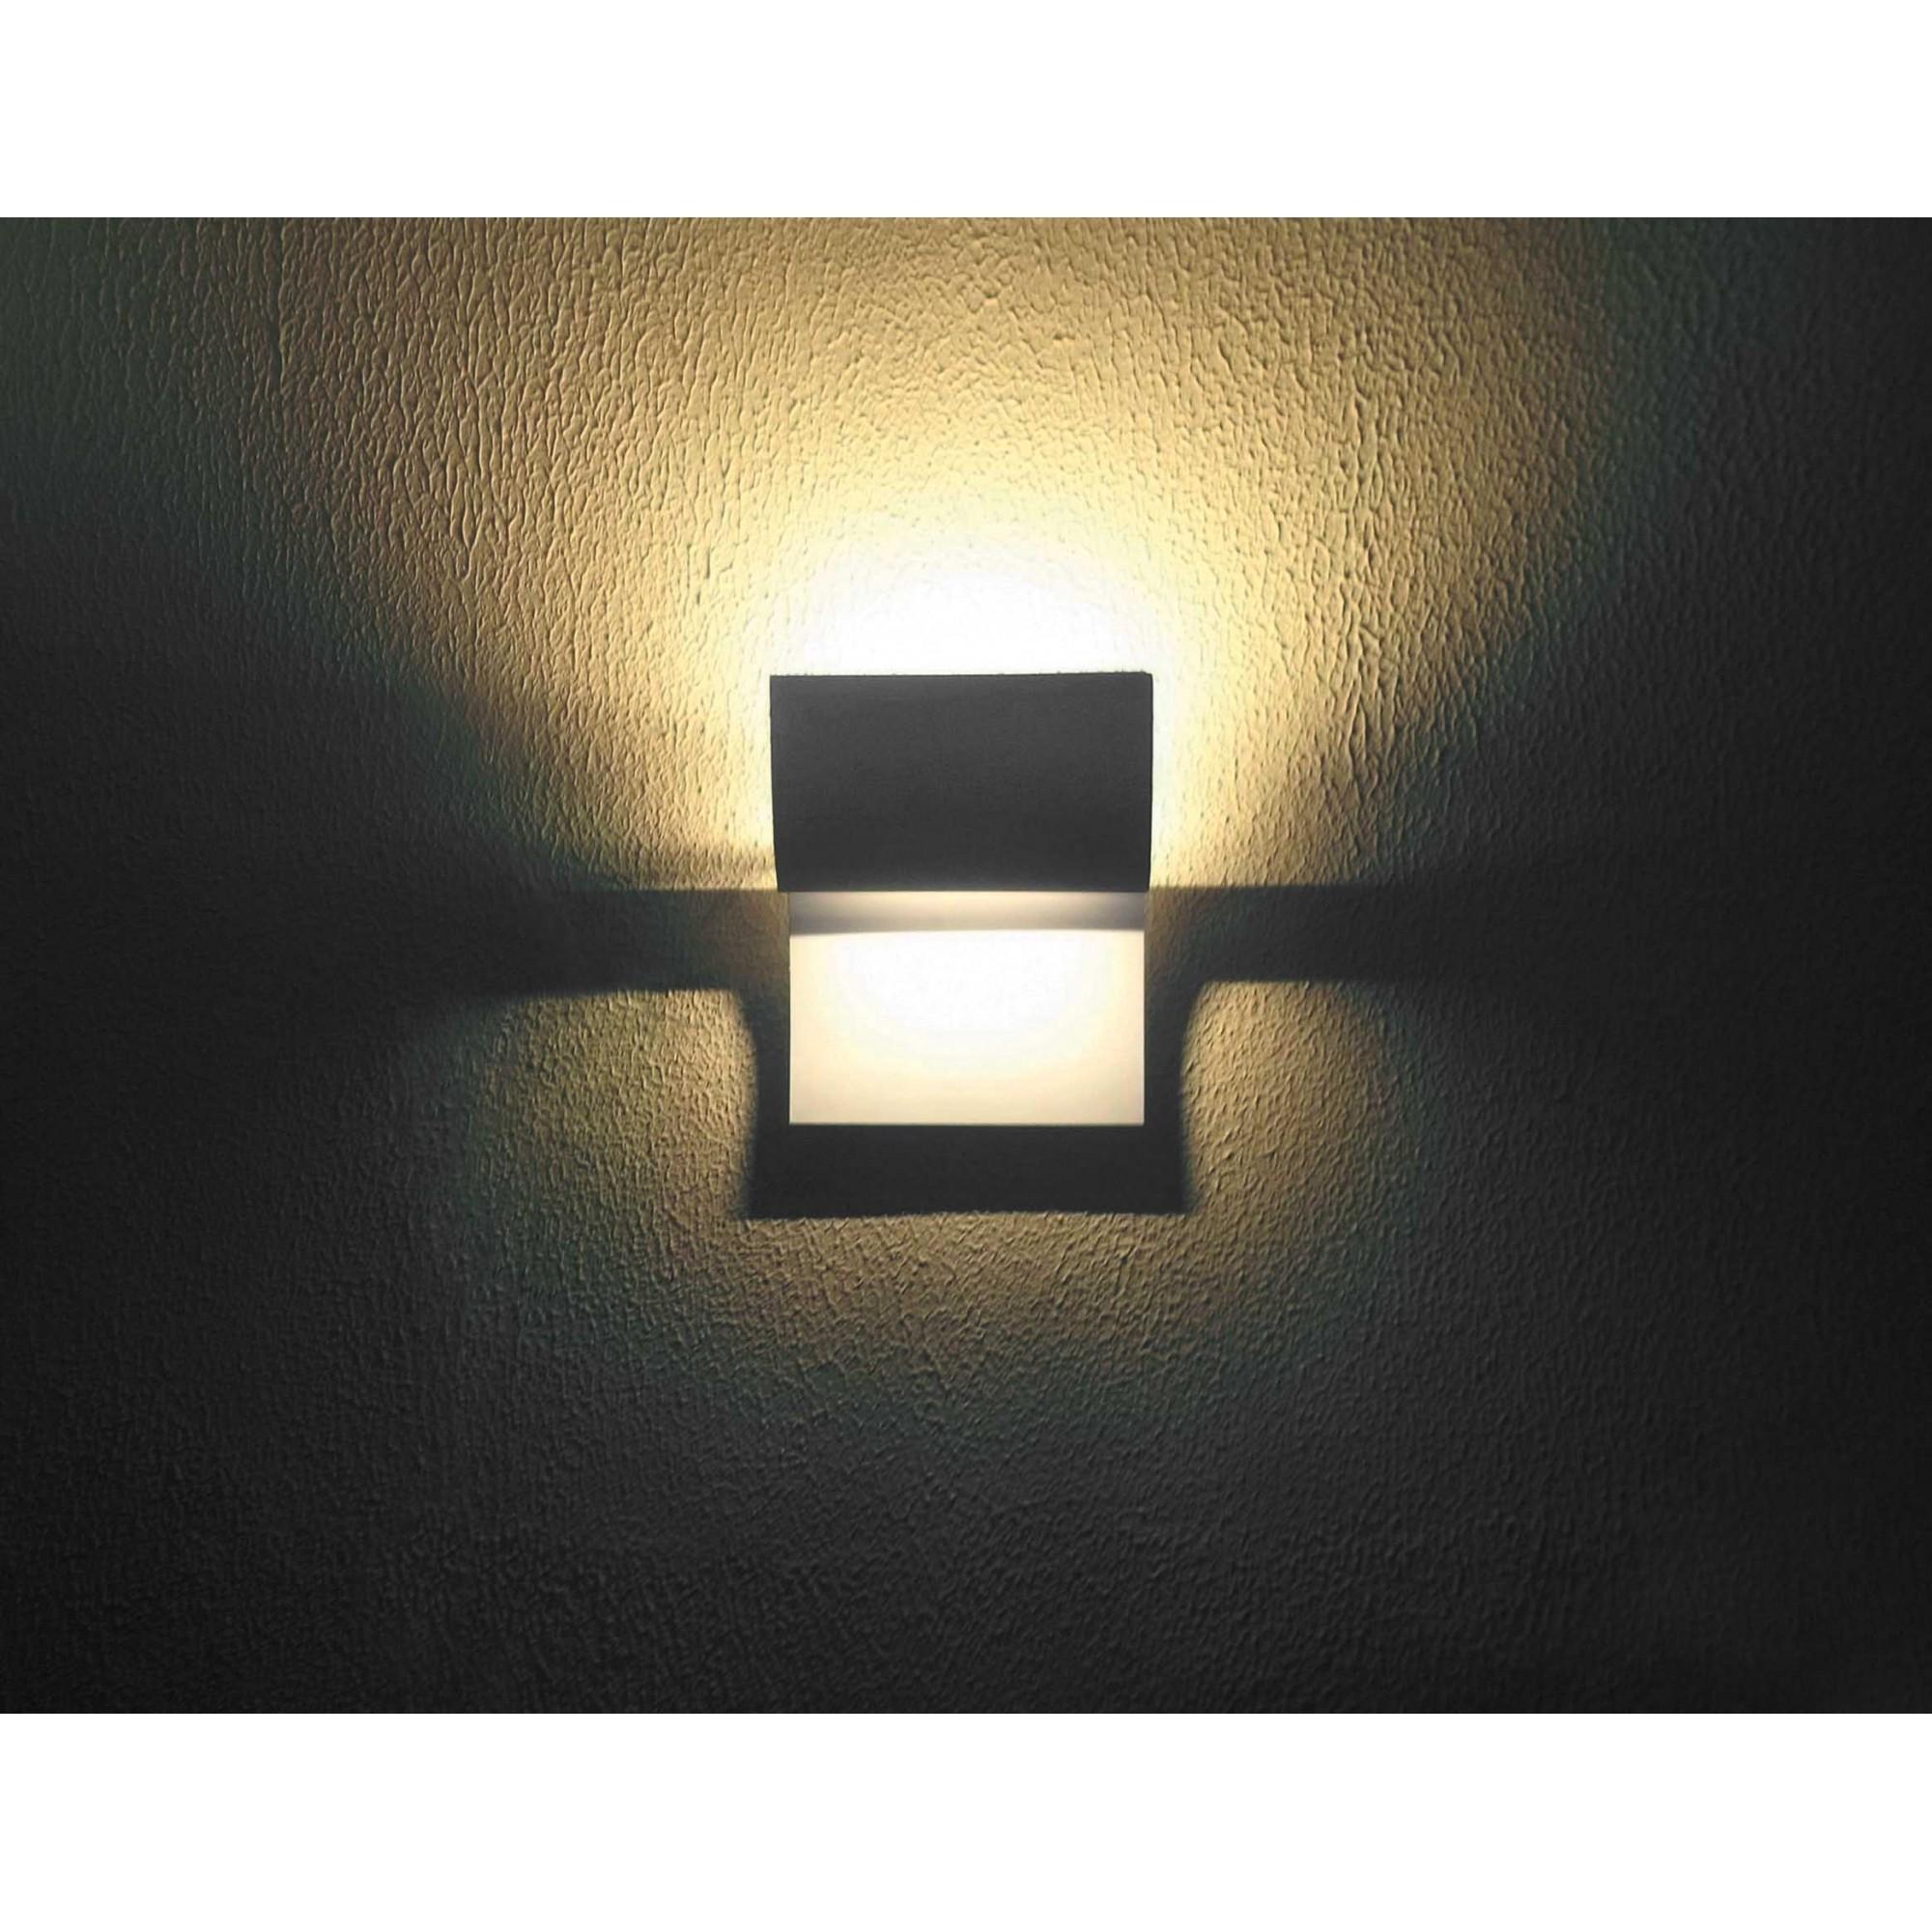 Arandela Pá Luz Indireta Lâmpada Halogena Preta Real